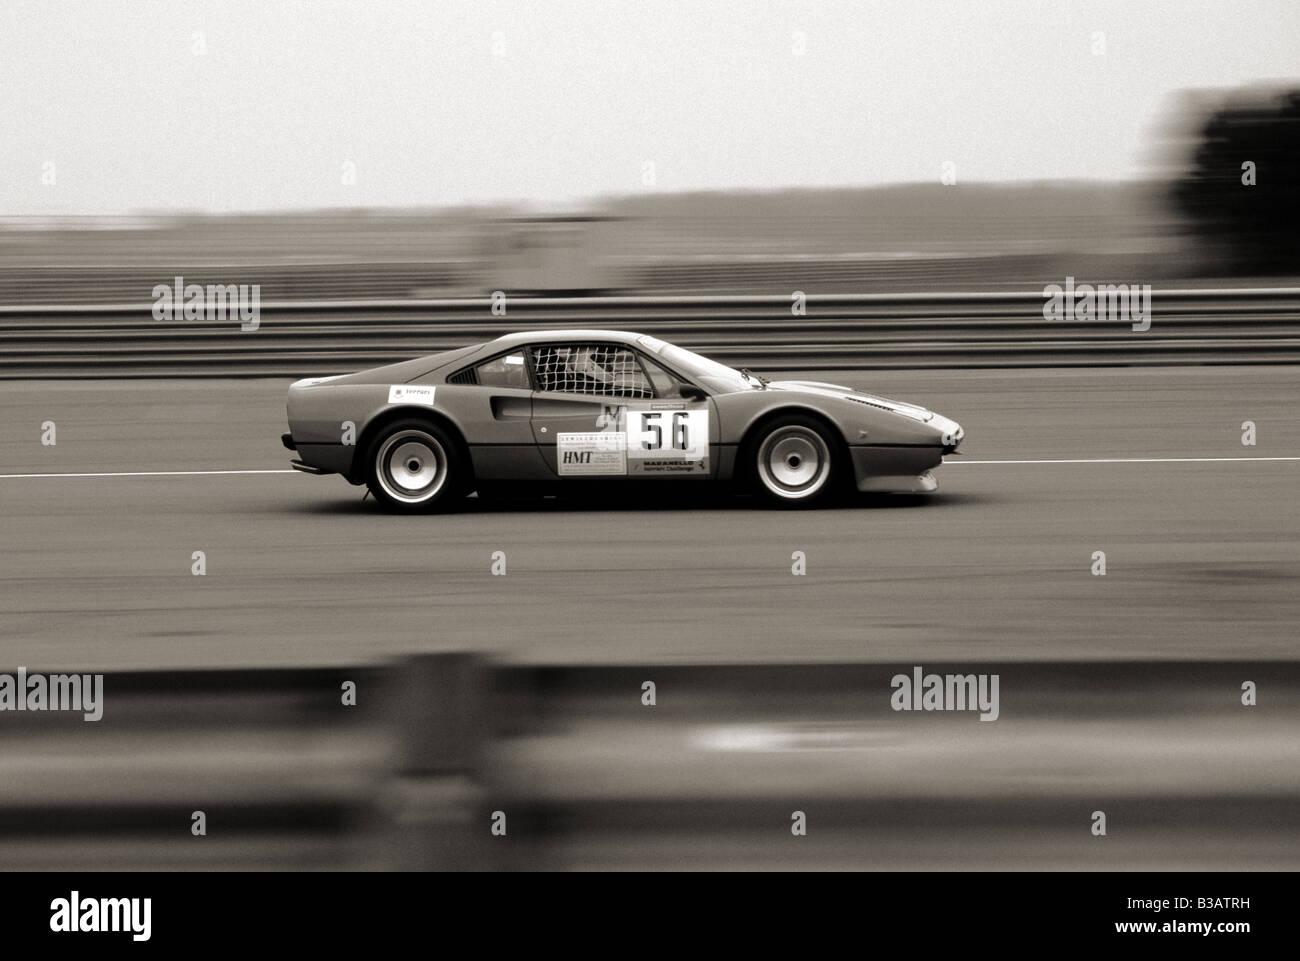 Ferrari 308 GTB. - Stock Image